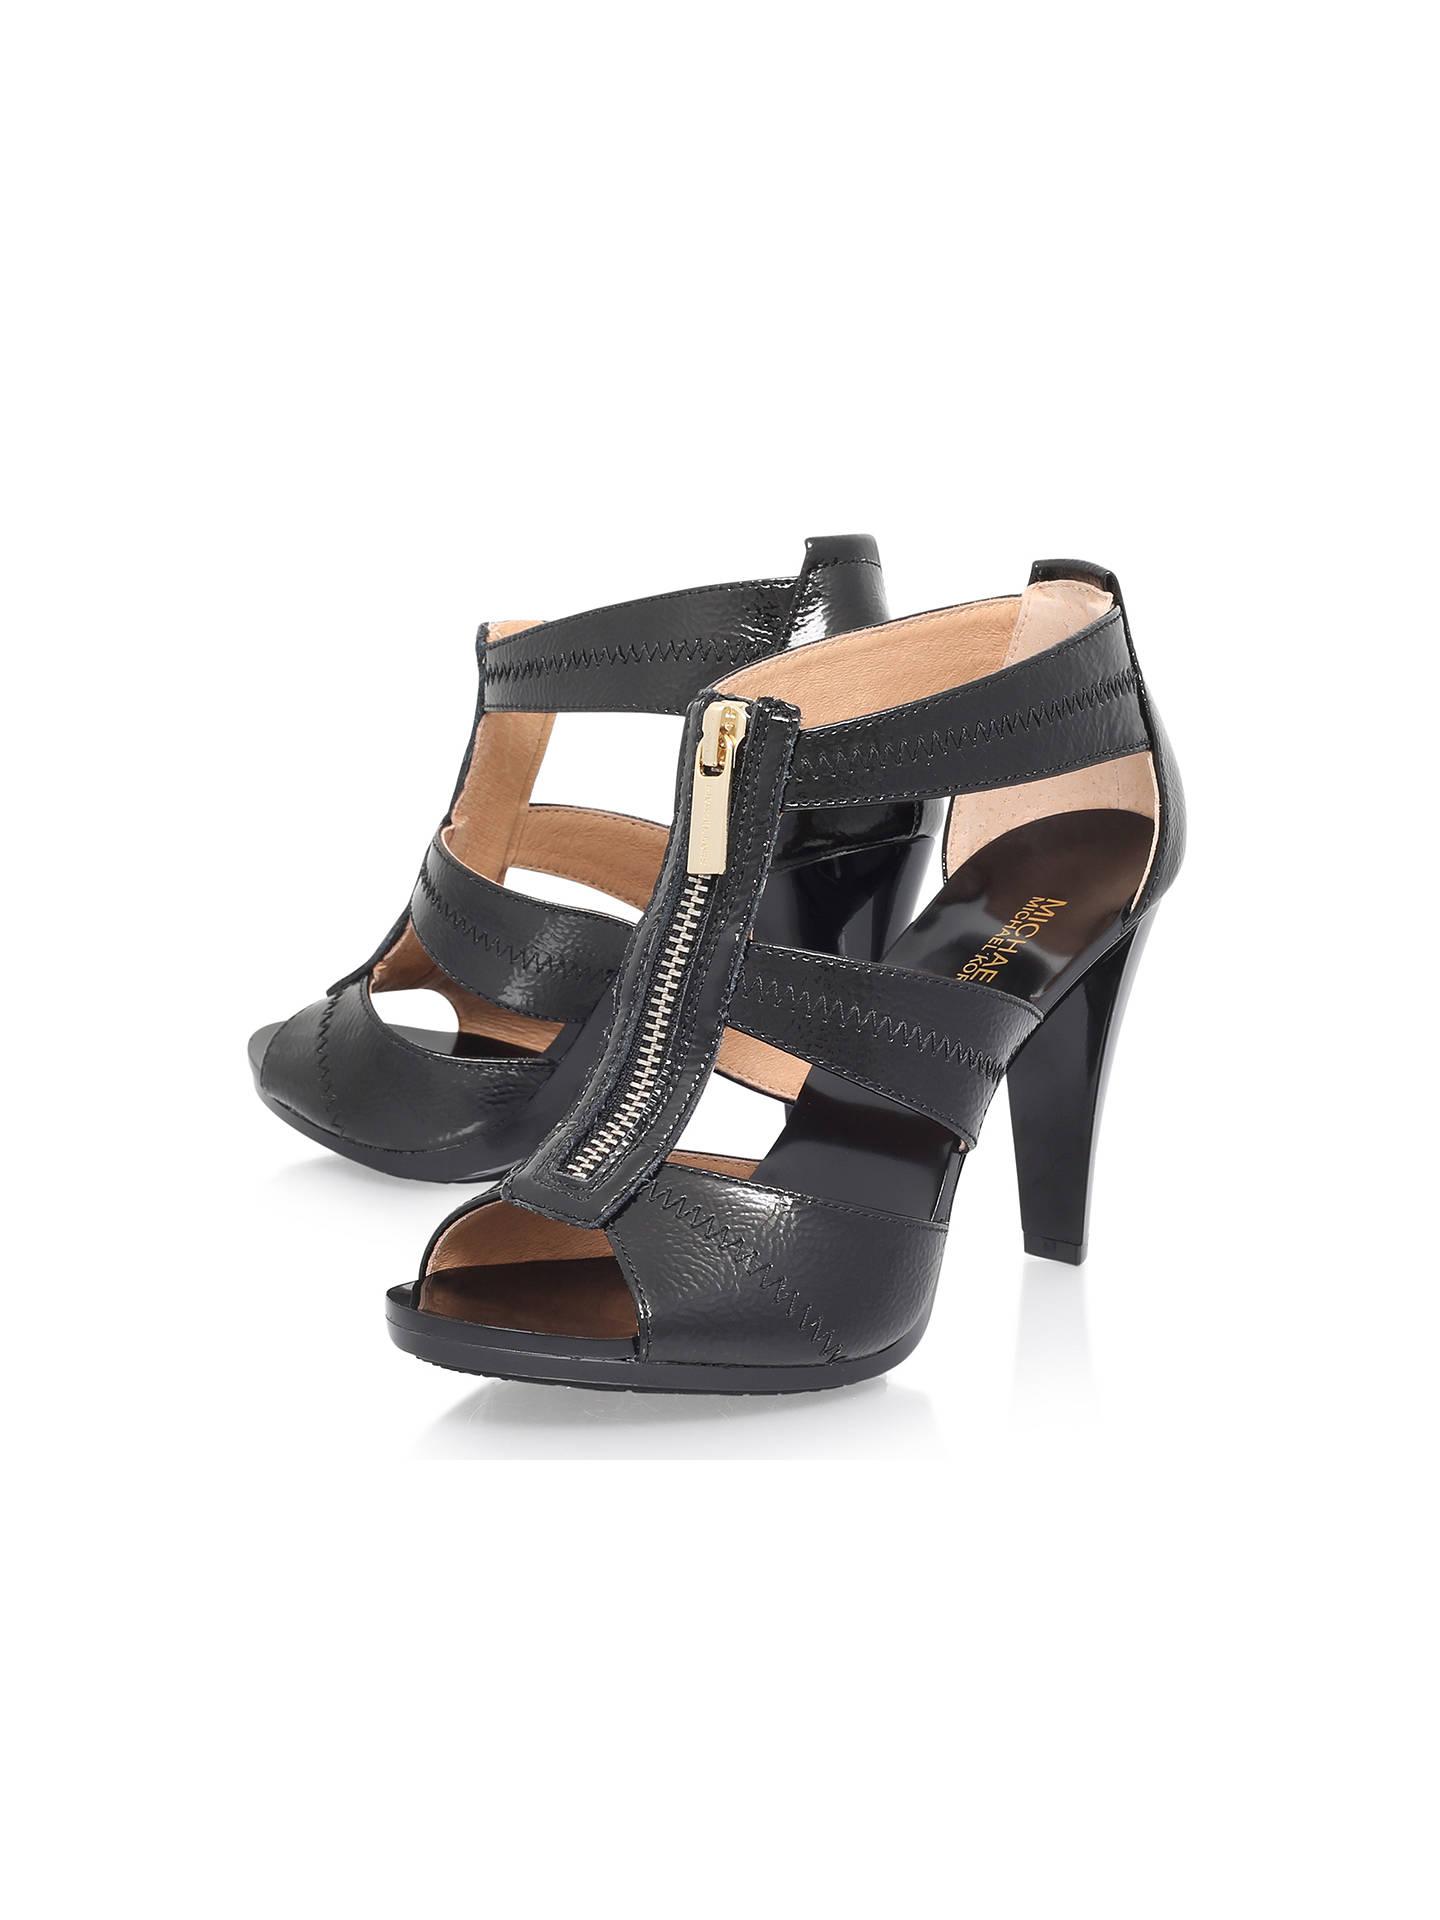 e57f7cca2657 MICHAEL Michael Kors Berkley Zip Front High Heel Sandals at John ...